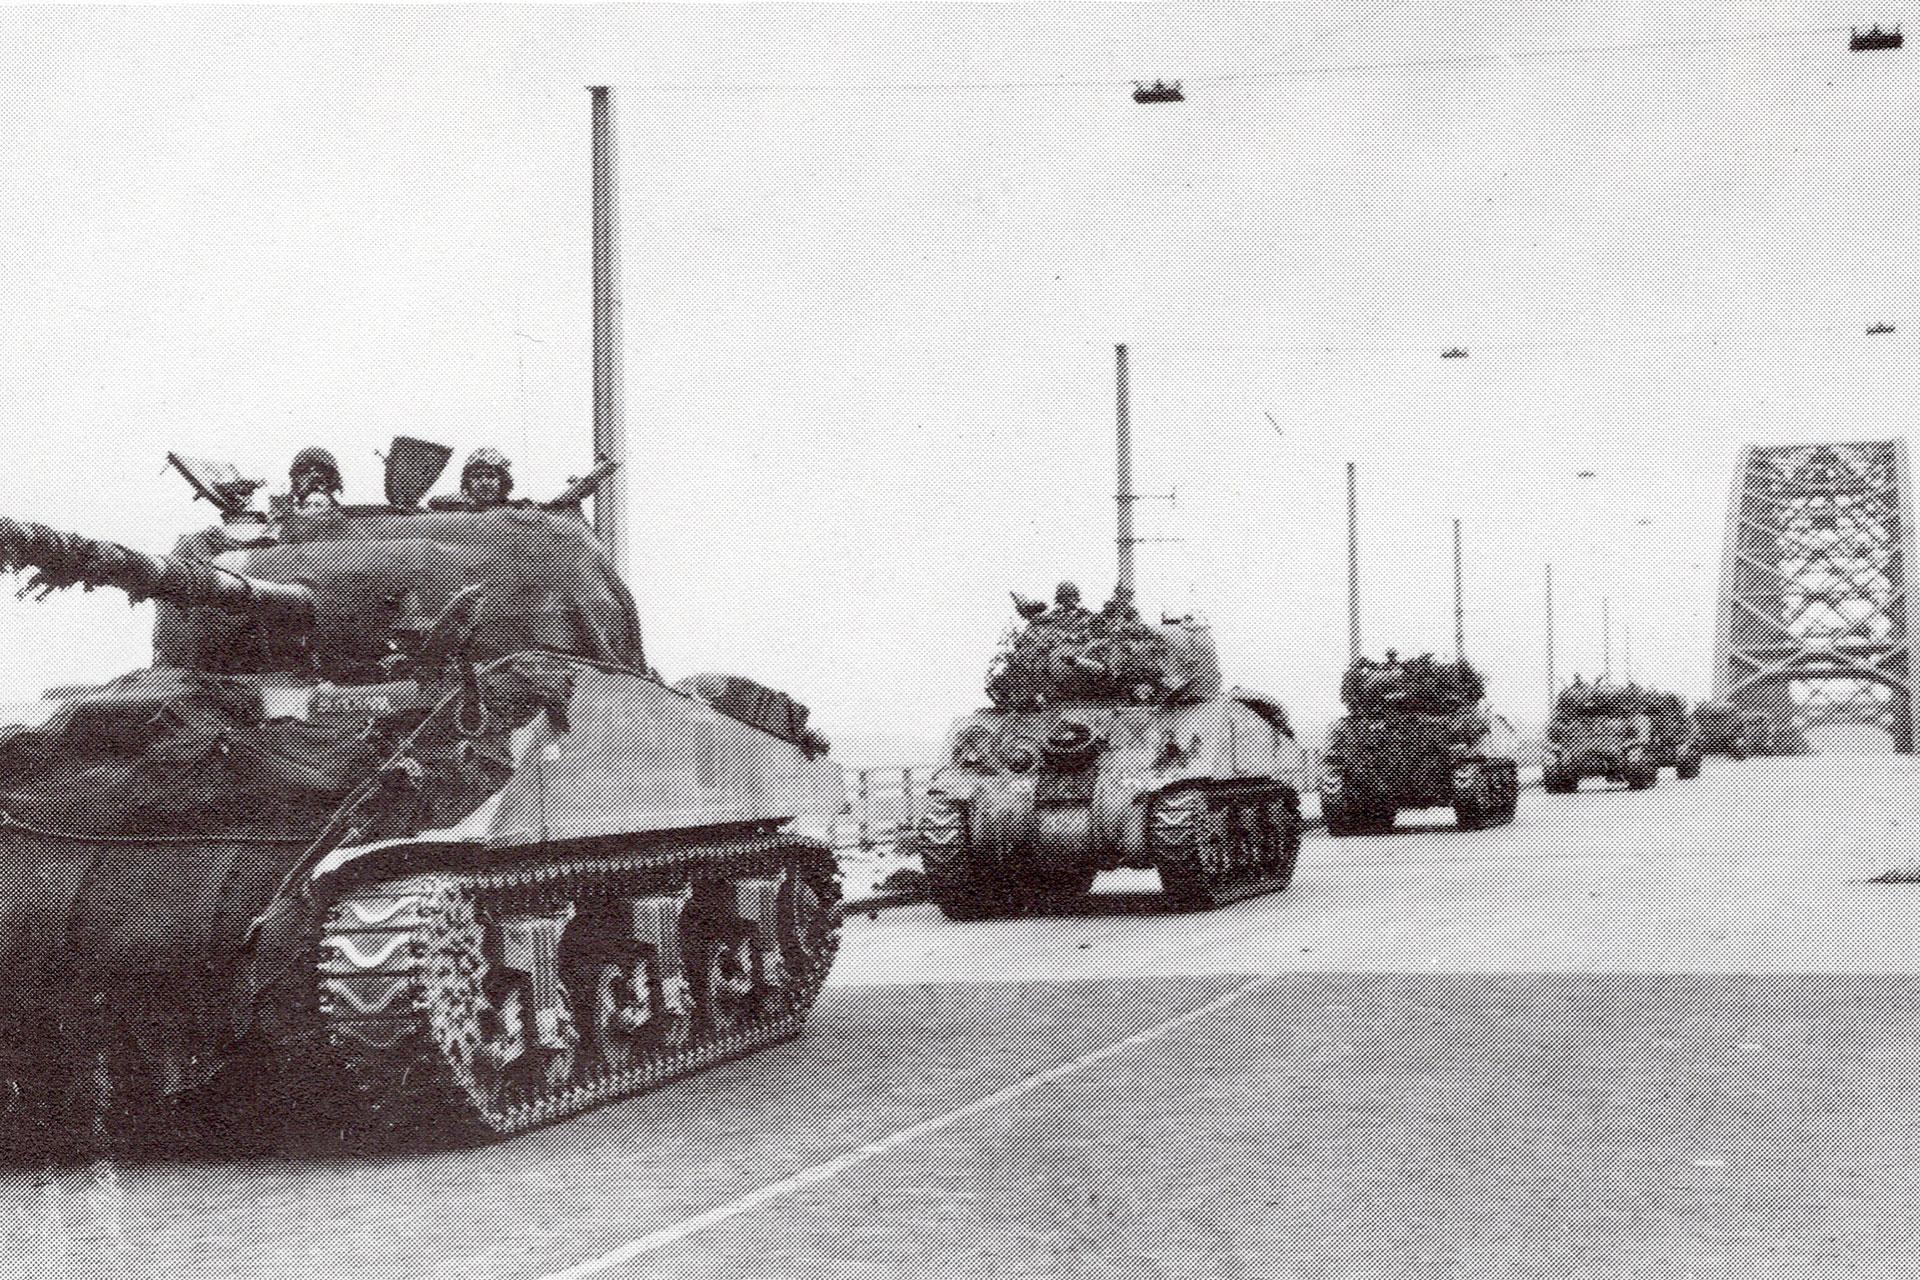 Sherman tanks crossing below, in September 1944.